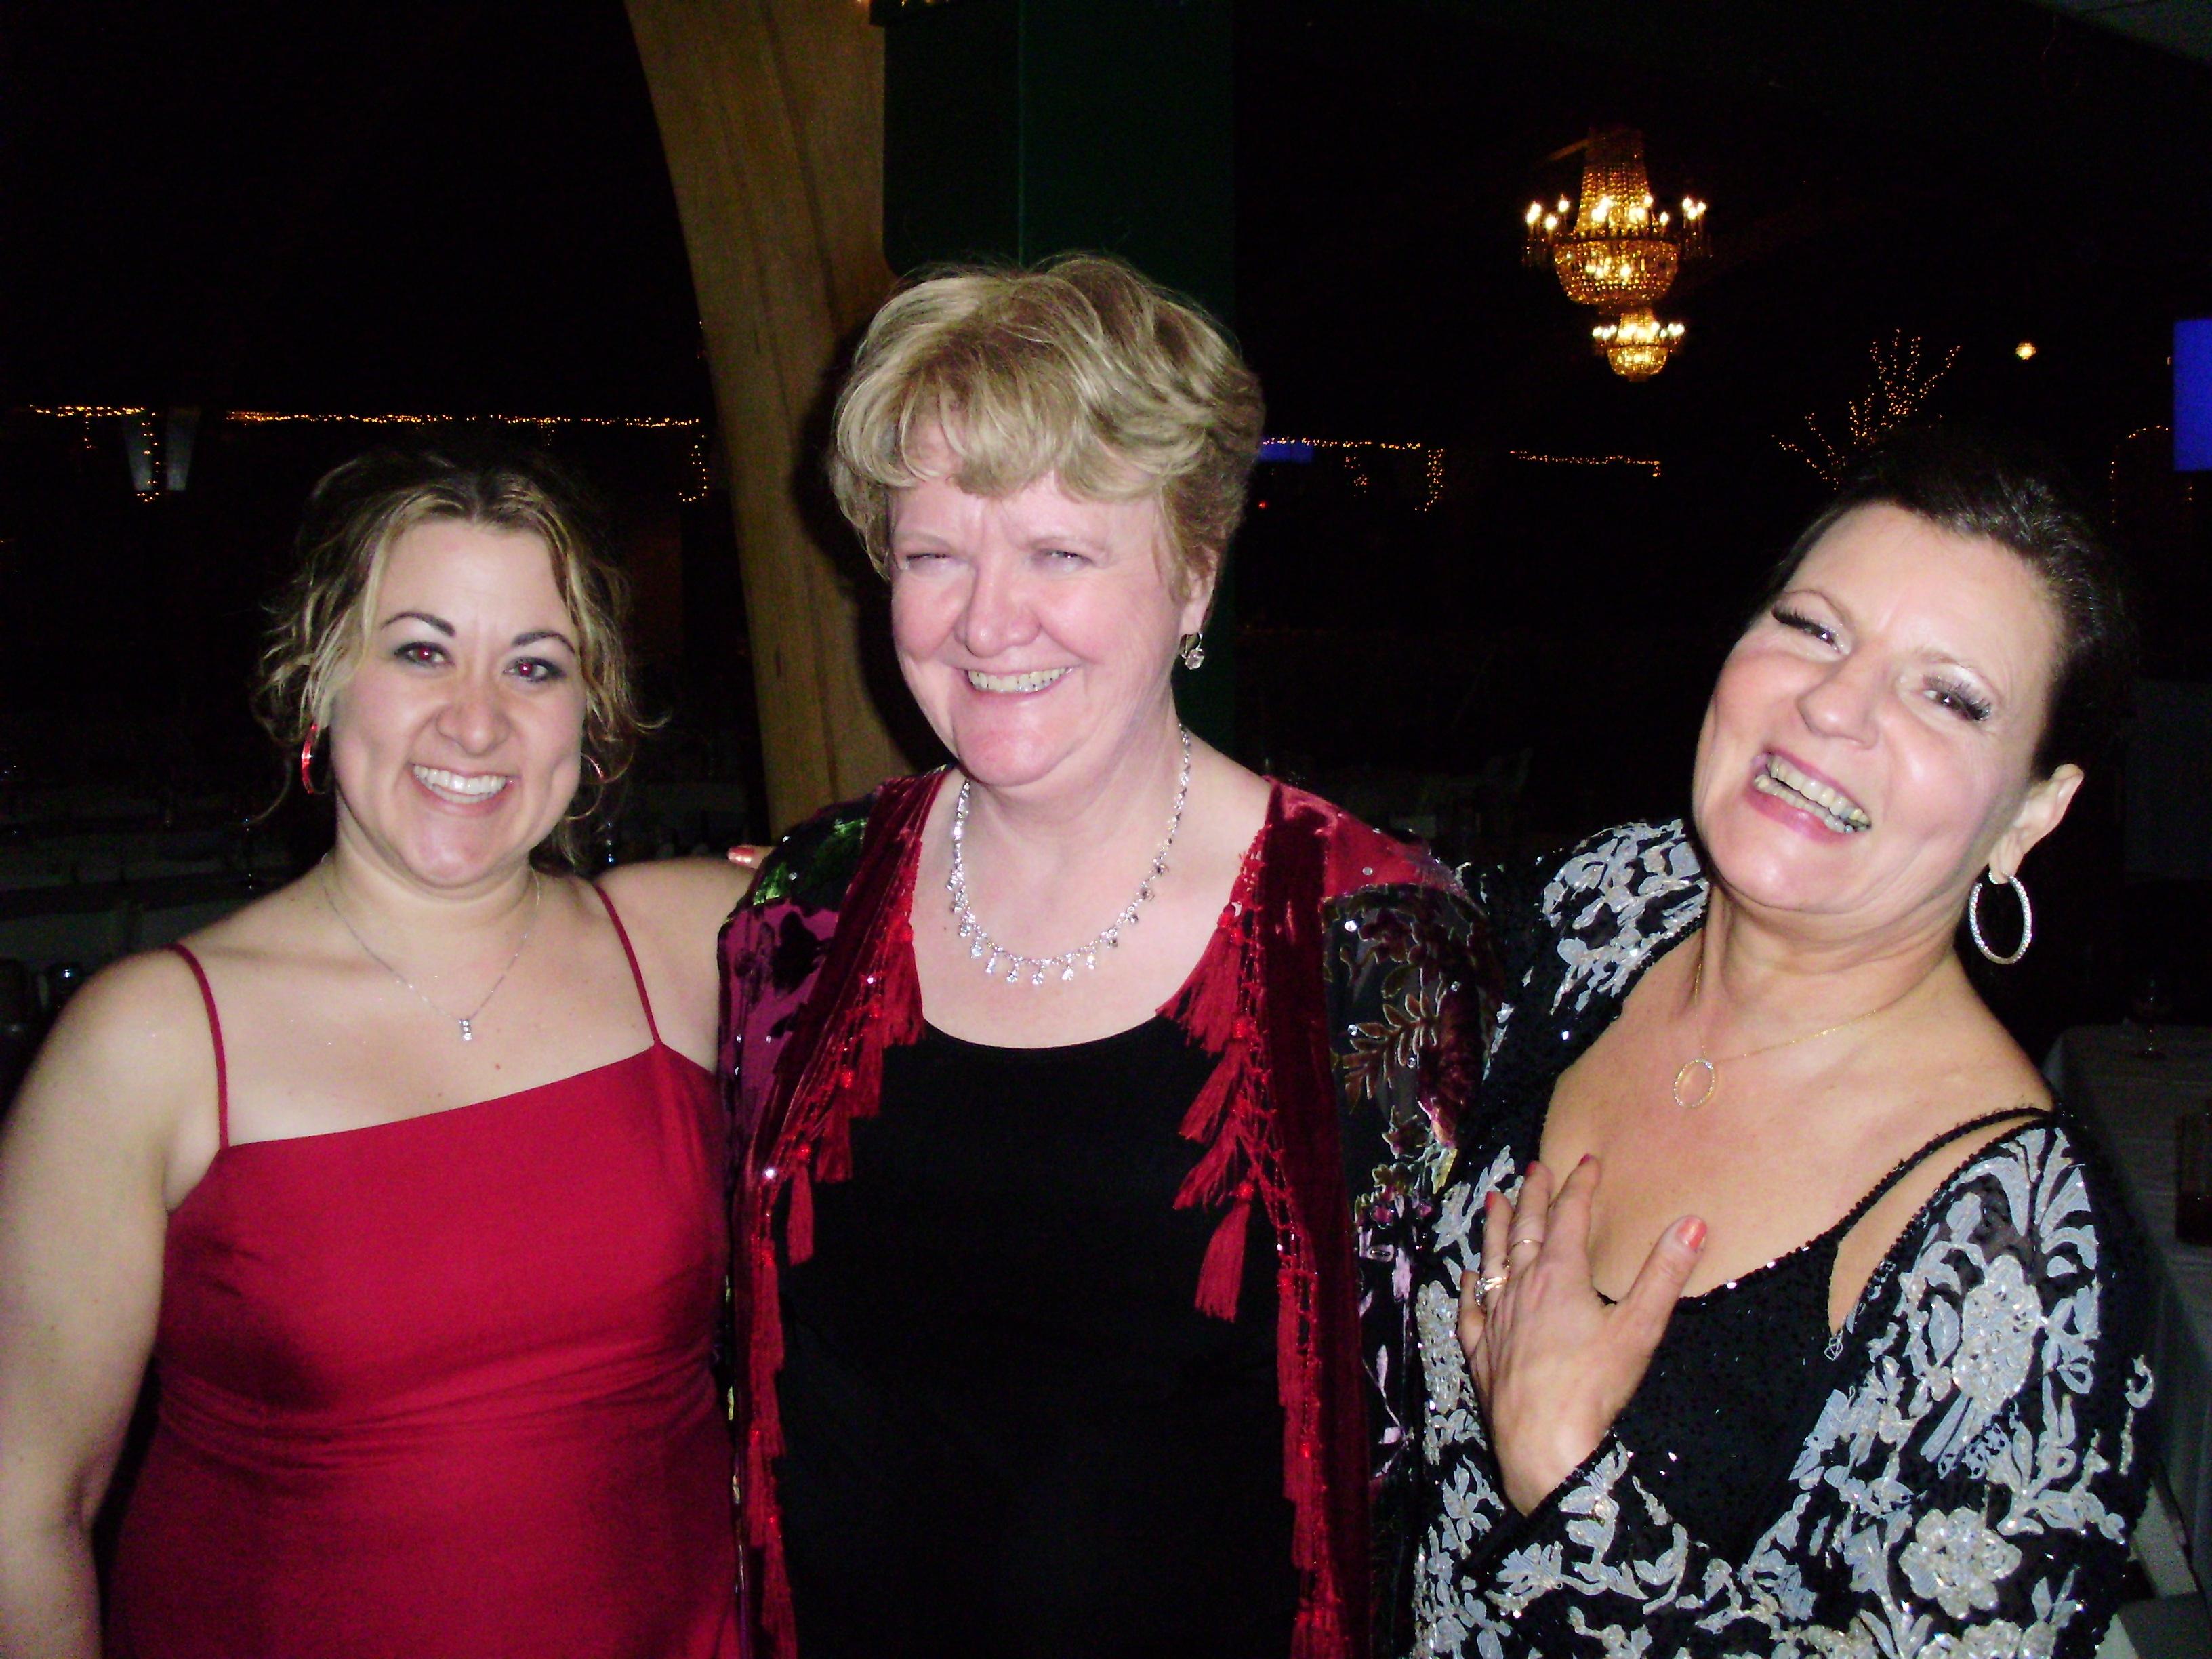 Jody, Mauree, and Janet